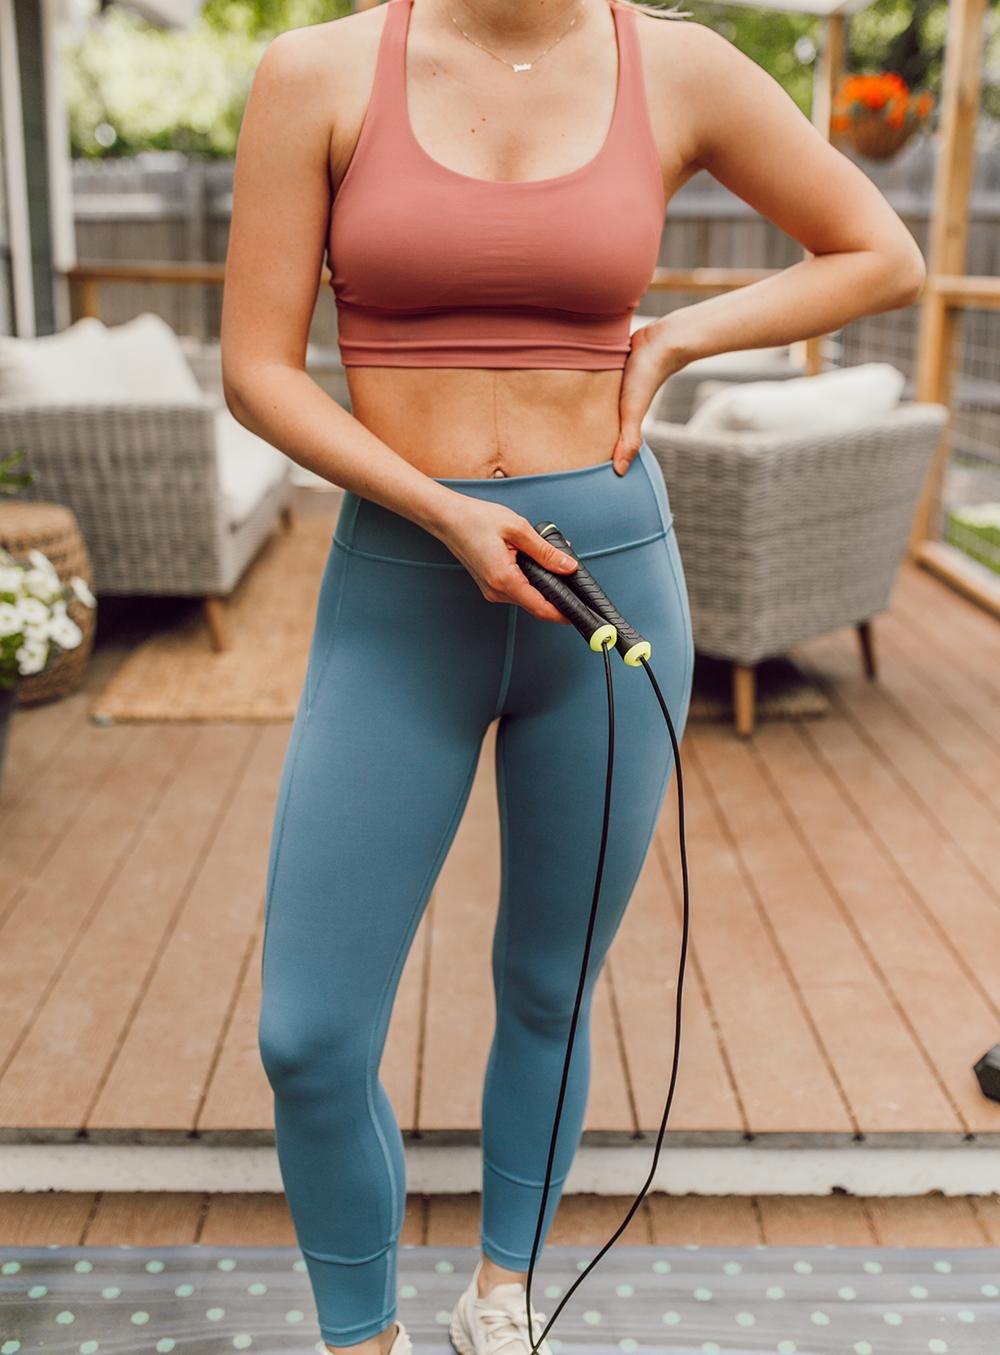 livvyland-blog-olivia-watson-austin-texas-lifestyle-blogger-lululemon-in-movement-leggings-long-lines-energy-bra-postpartum-workout-routine-3